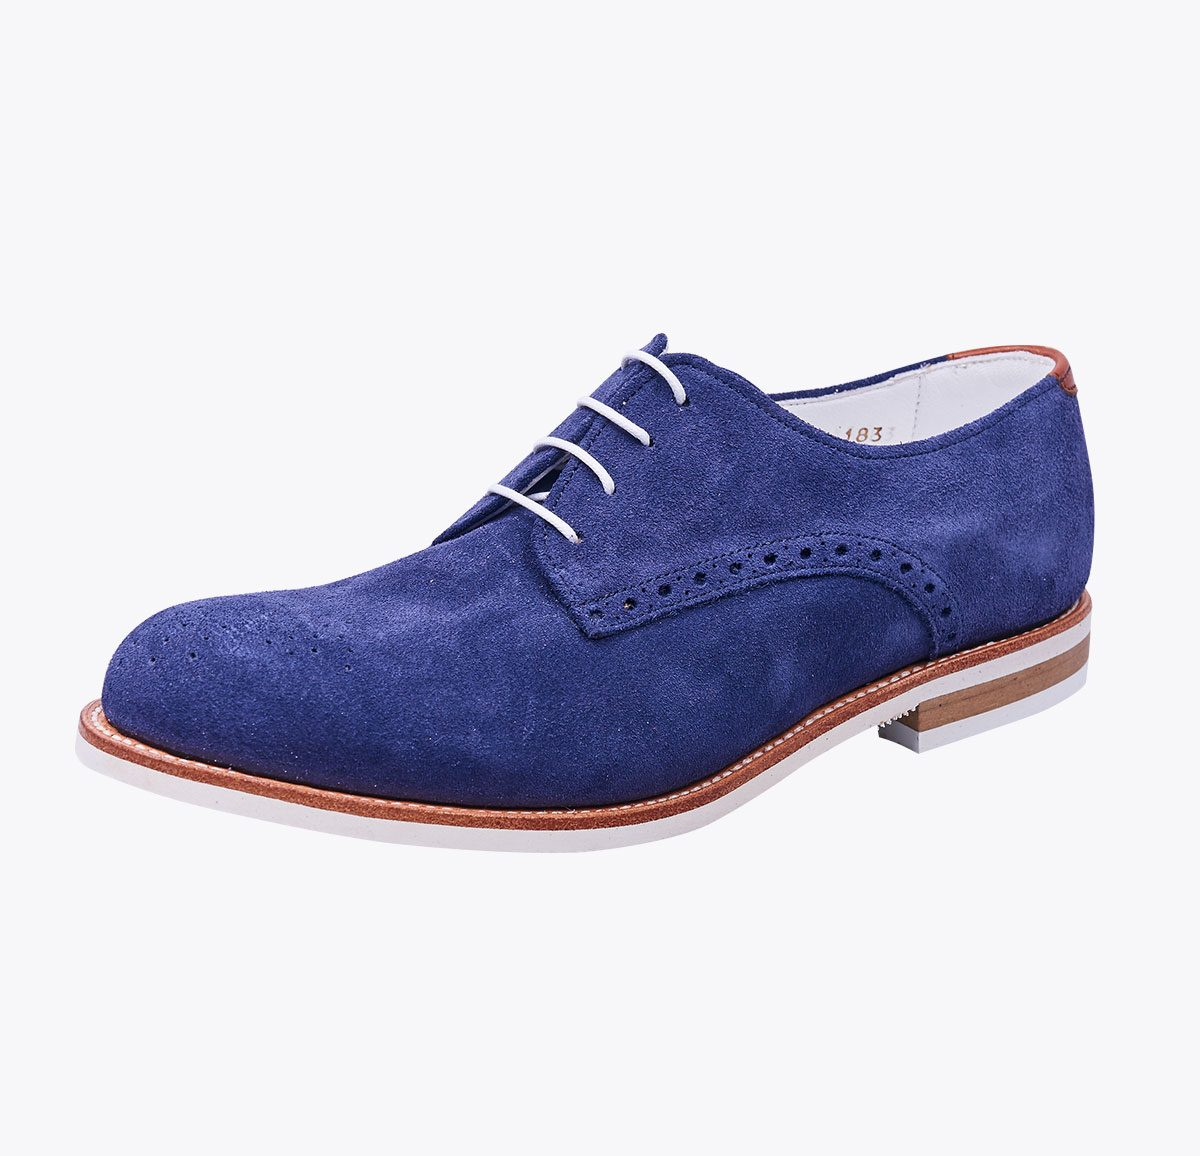 Zapato summer 1 navy hecho a mano en mandalashoes, Santanyí Mallorca. Hand made shoes. Nach Mass Schuhe